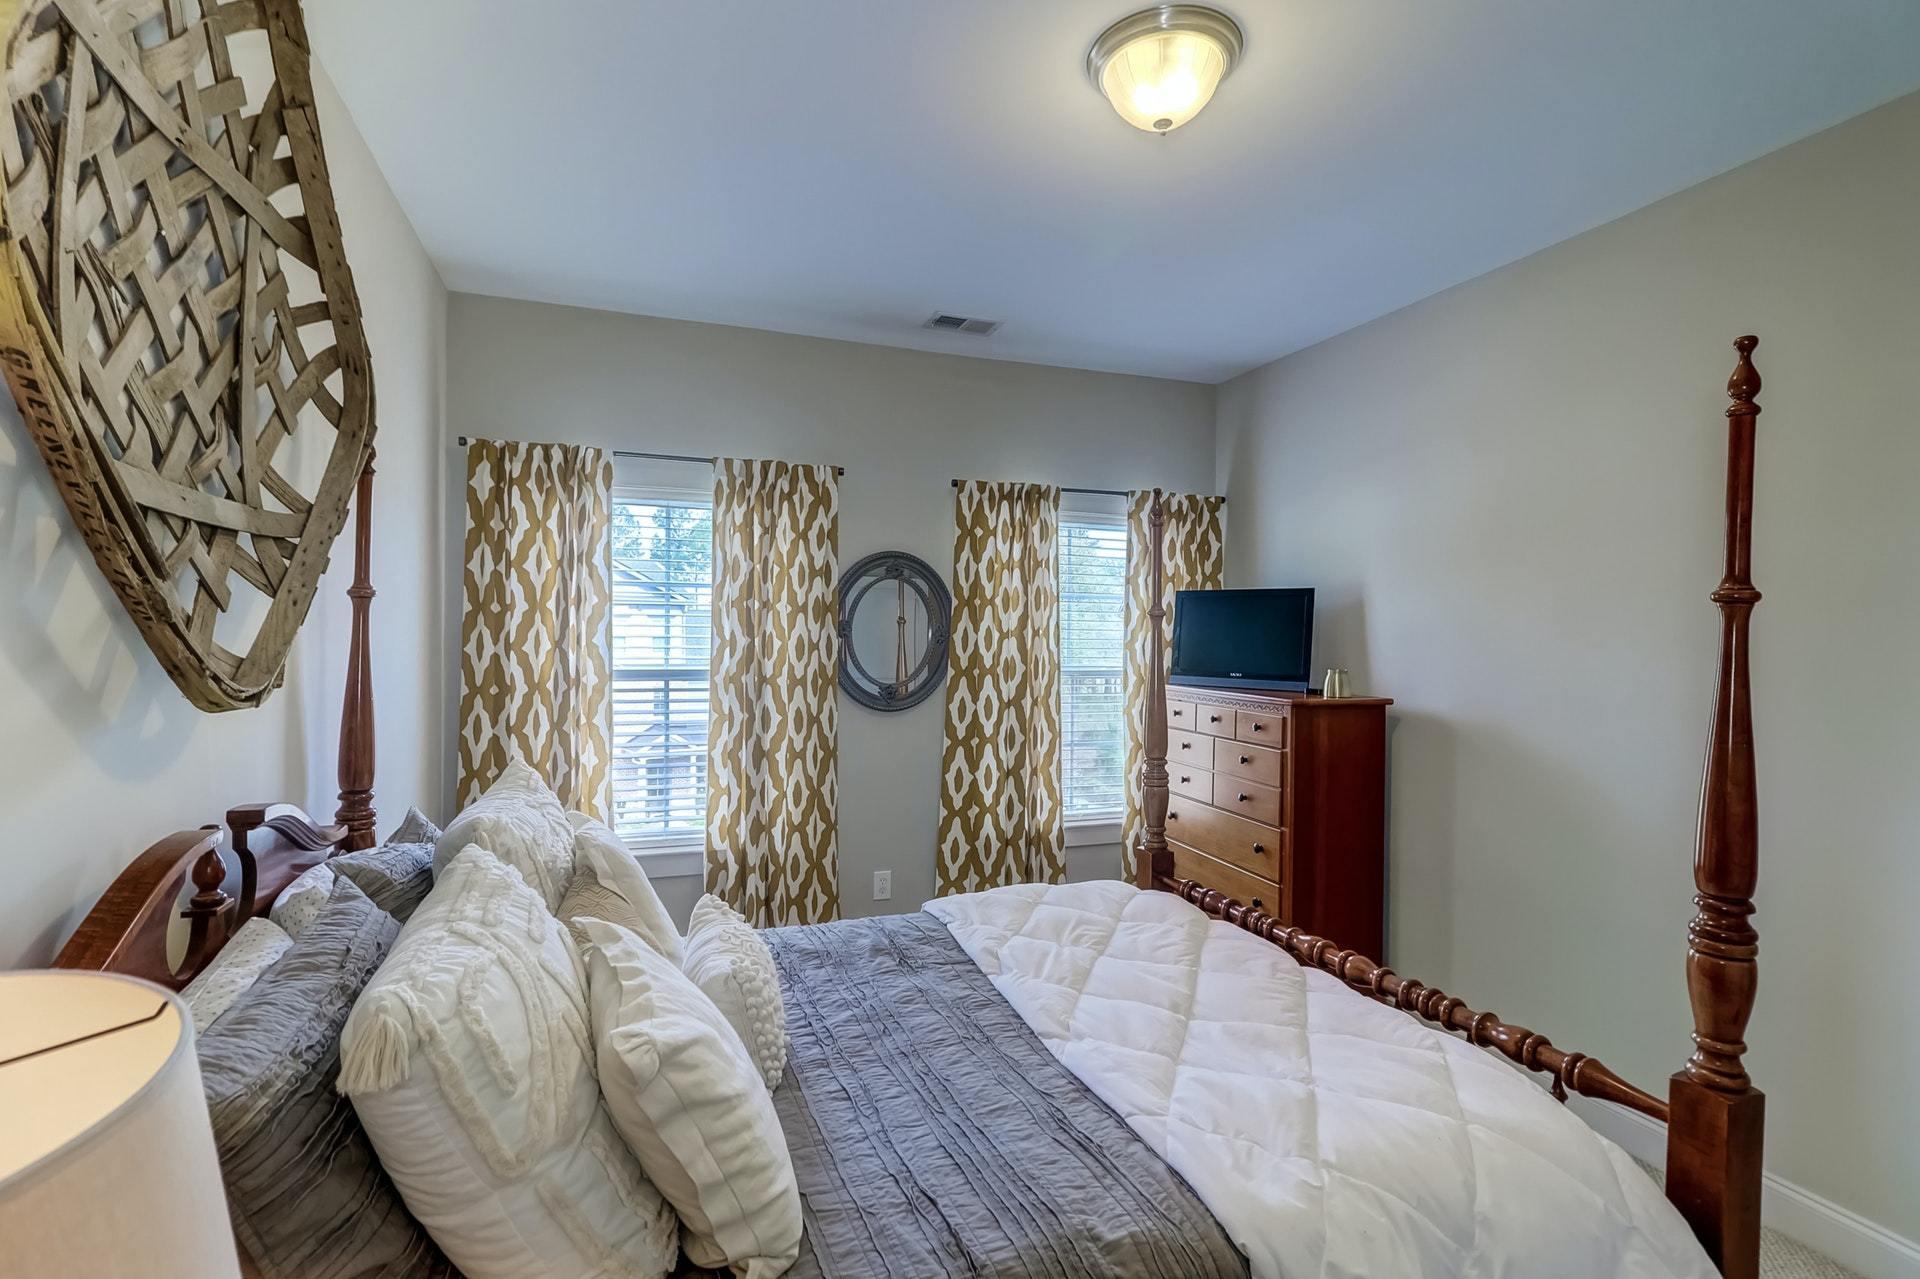 Etiwan Pointe Homes For Sale - 220 Slipper Shell, Mount Pleasant, SC - 14